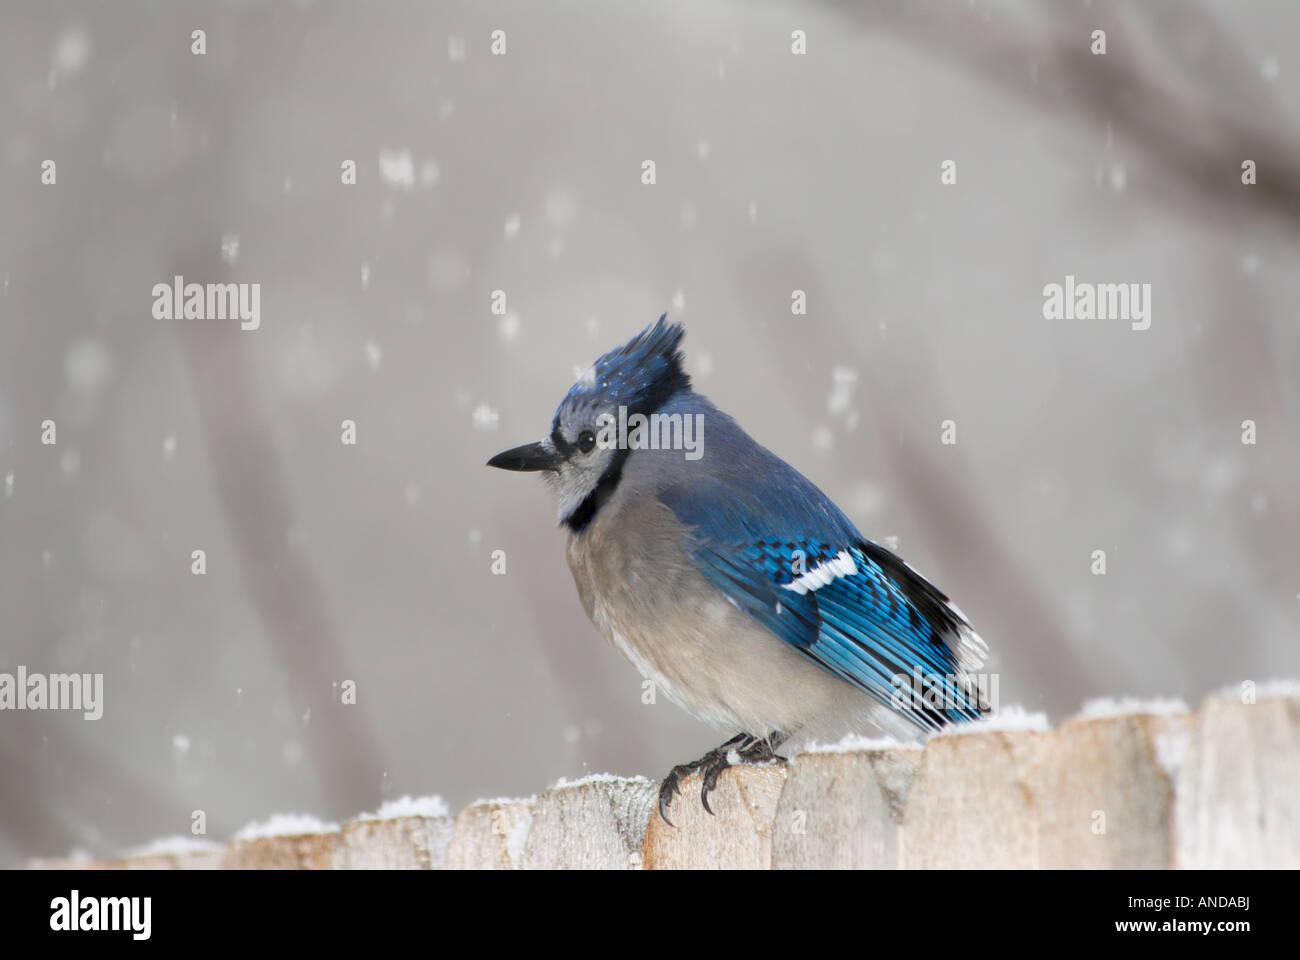 A Blue Jay (Cyanocitta cristata) sits on a fence during a light snowfall. Oklahoma,USA. Stock Photo